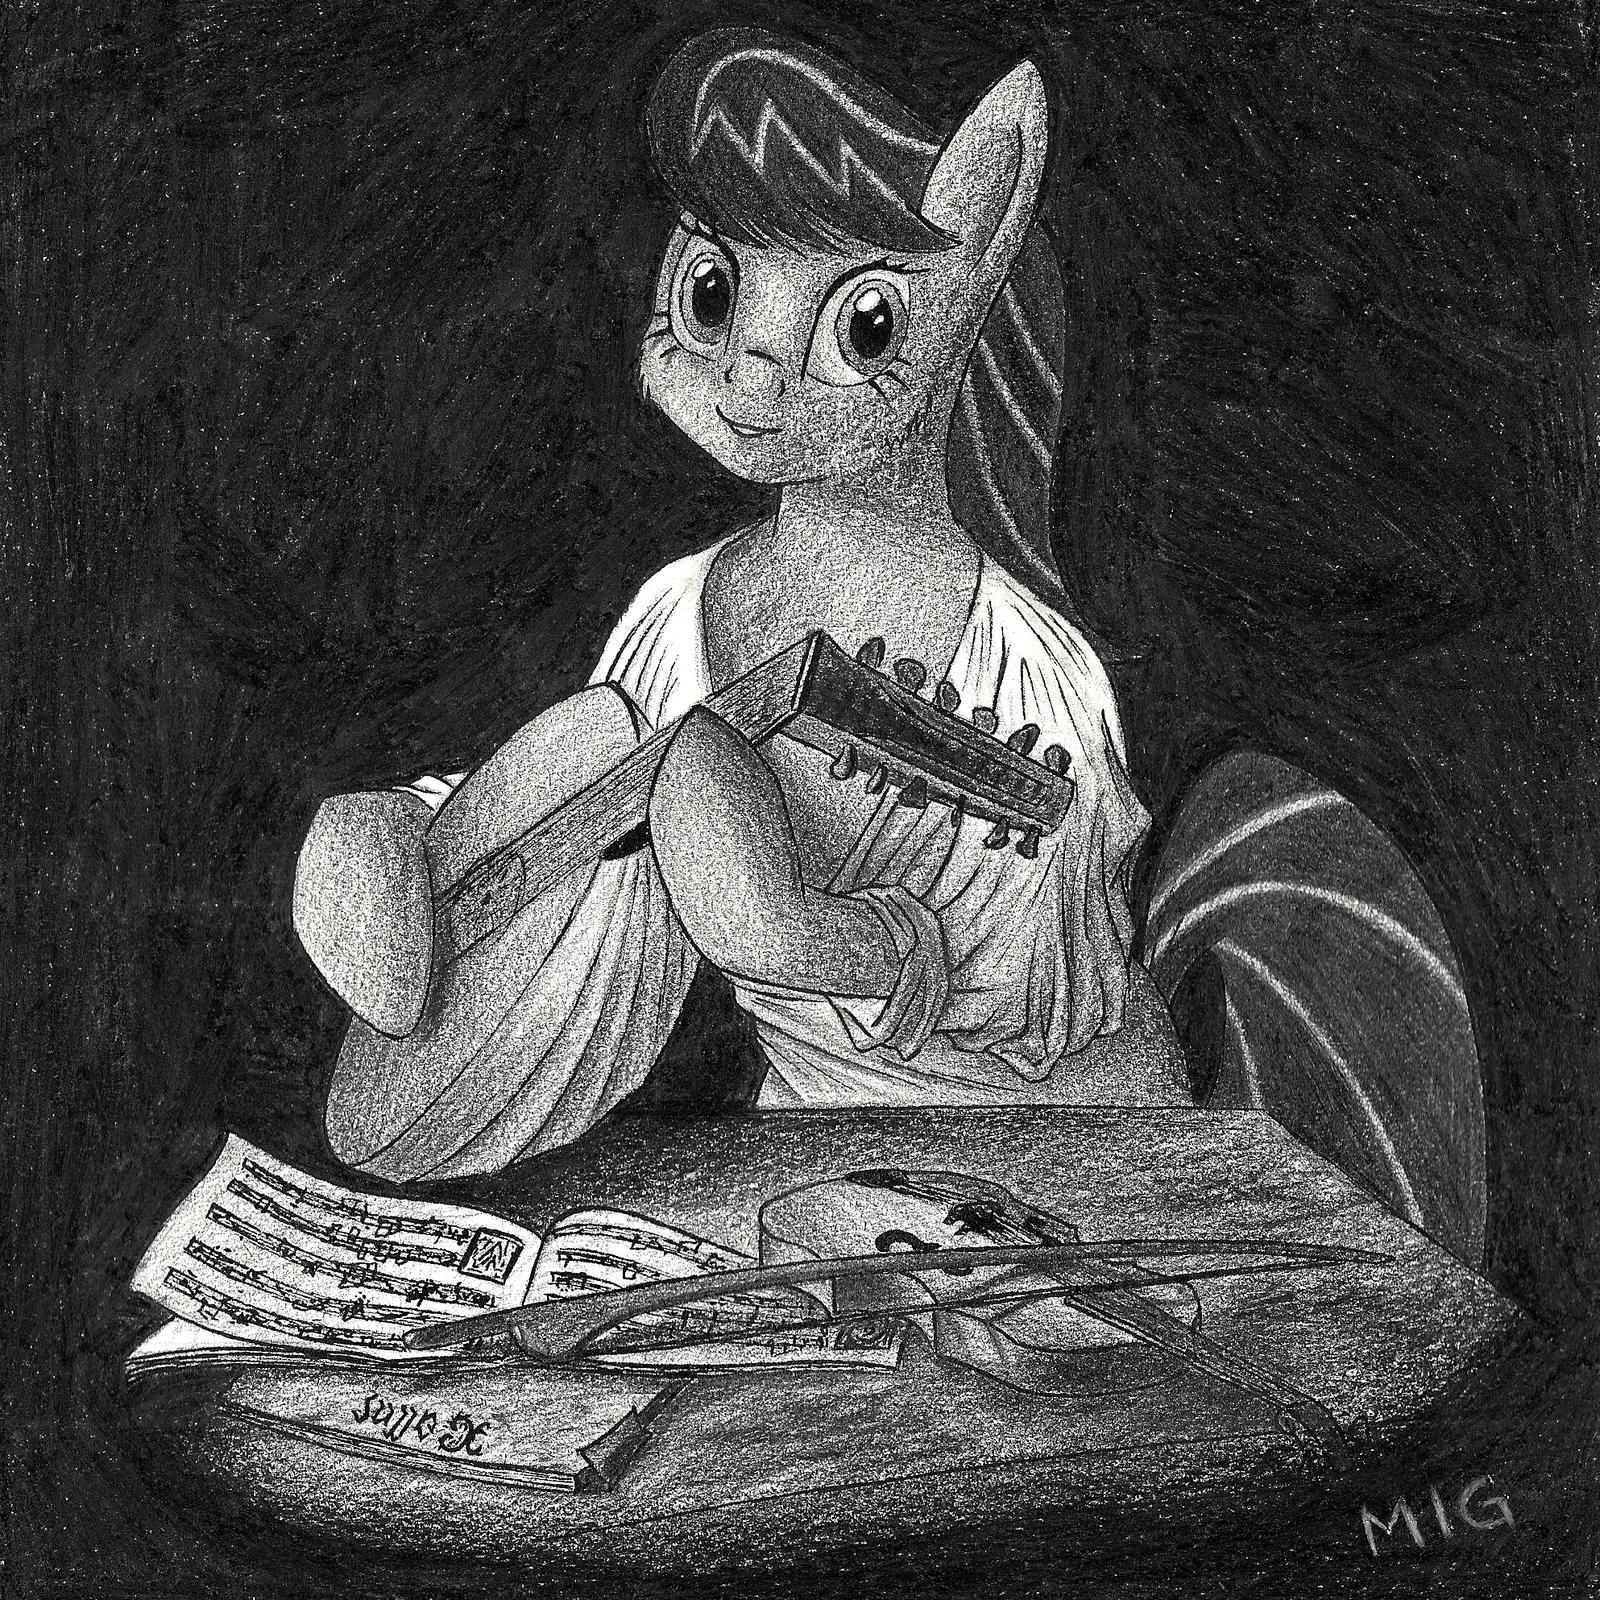 Octavia's Lute